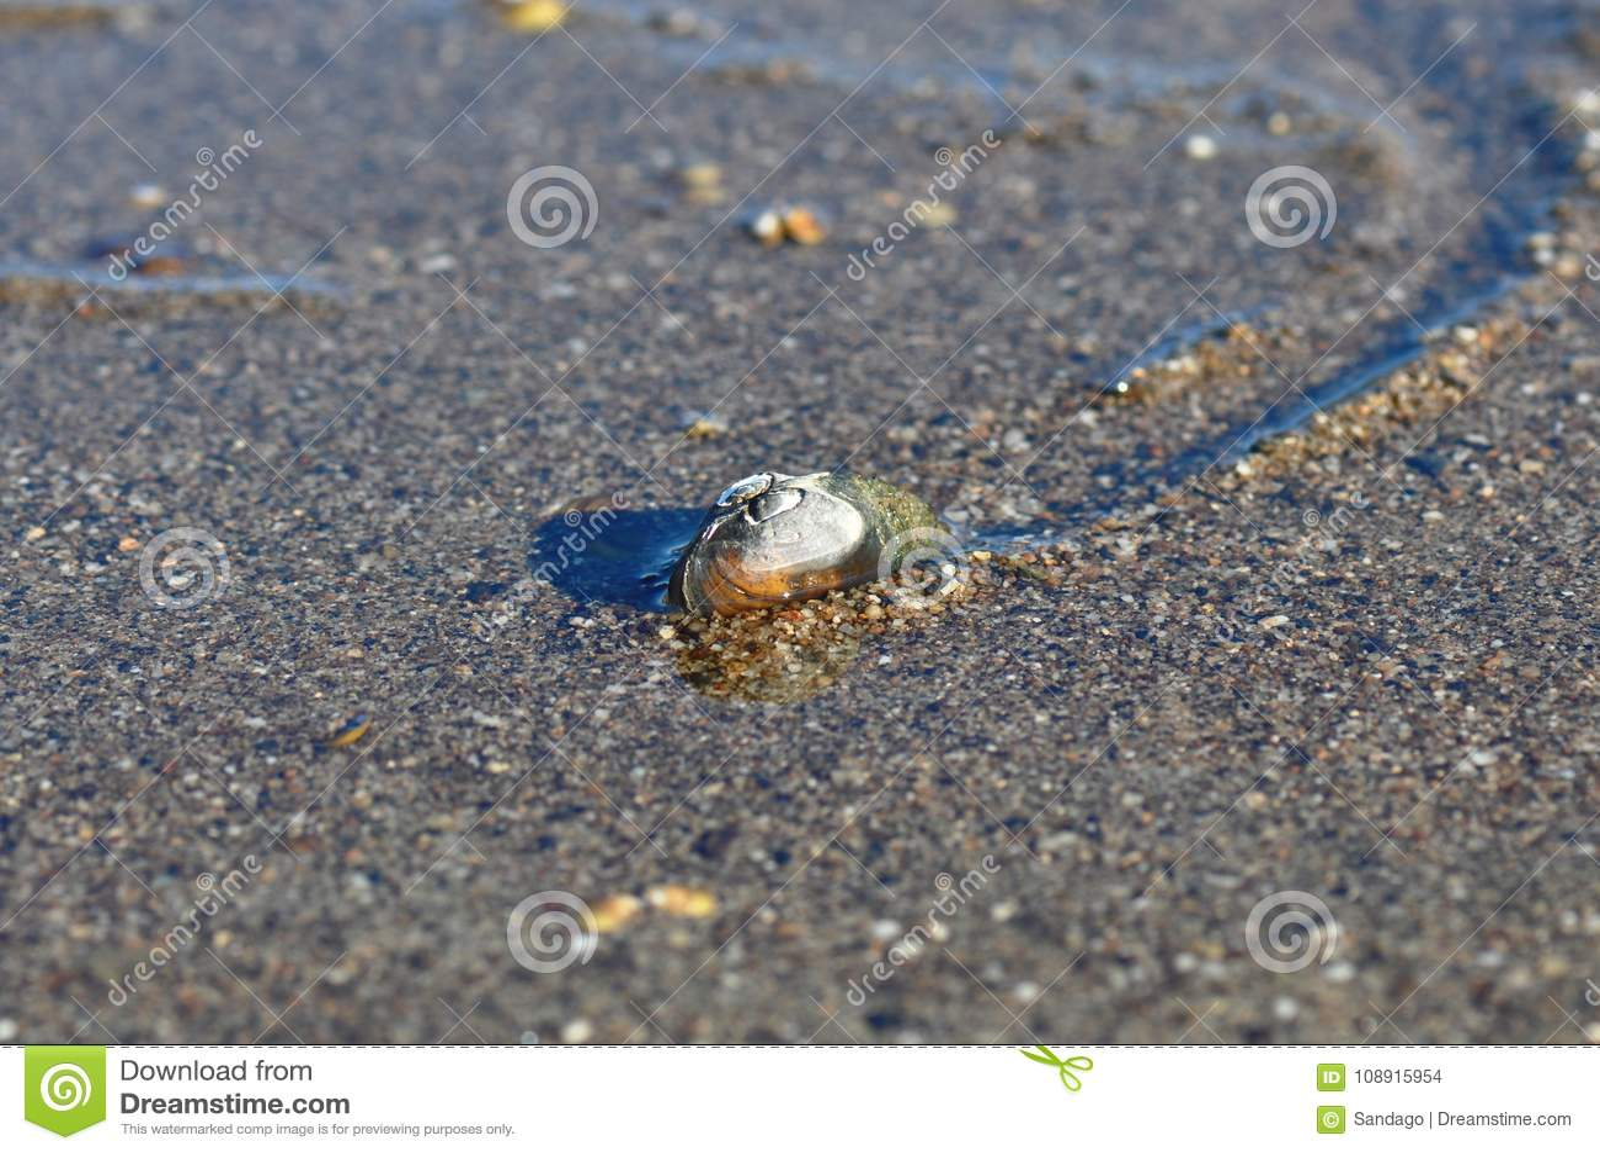 Mejillones de agua dulce, unionoida bivalvo acuático de los mulluscs